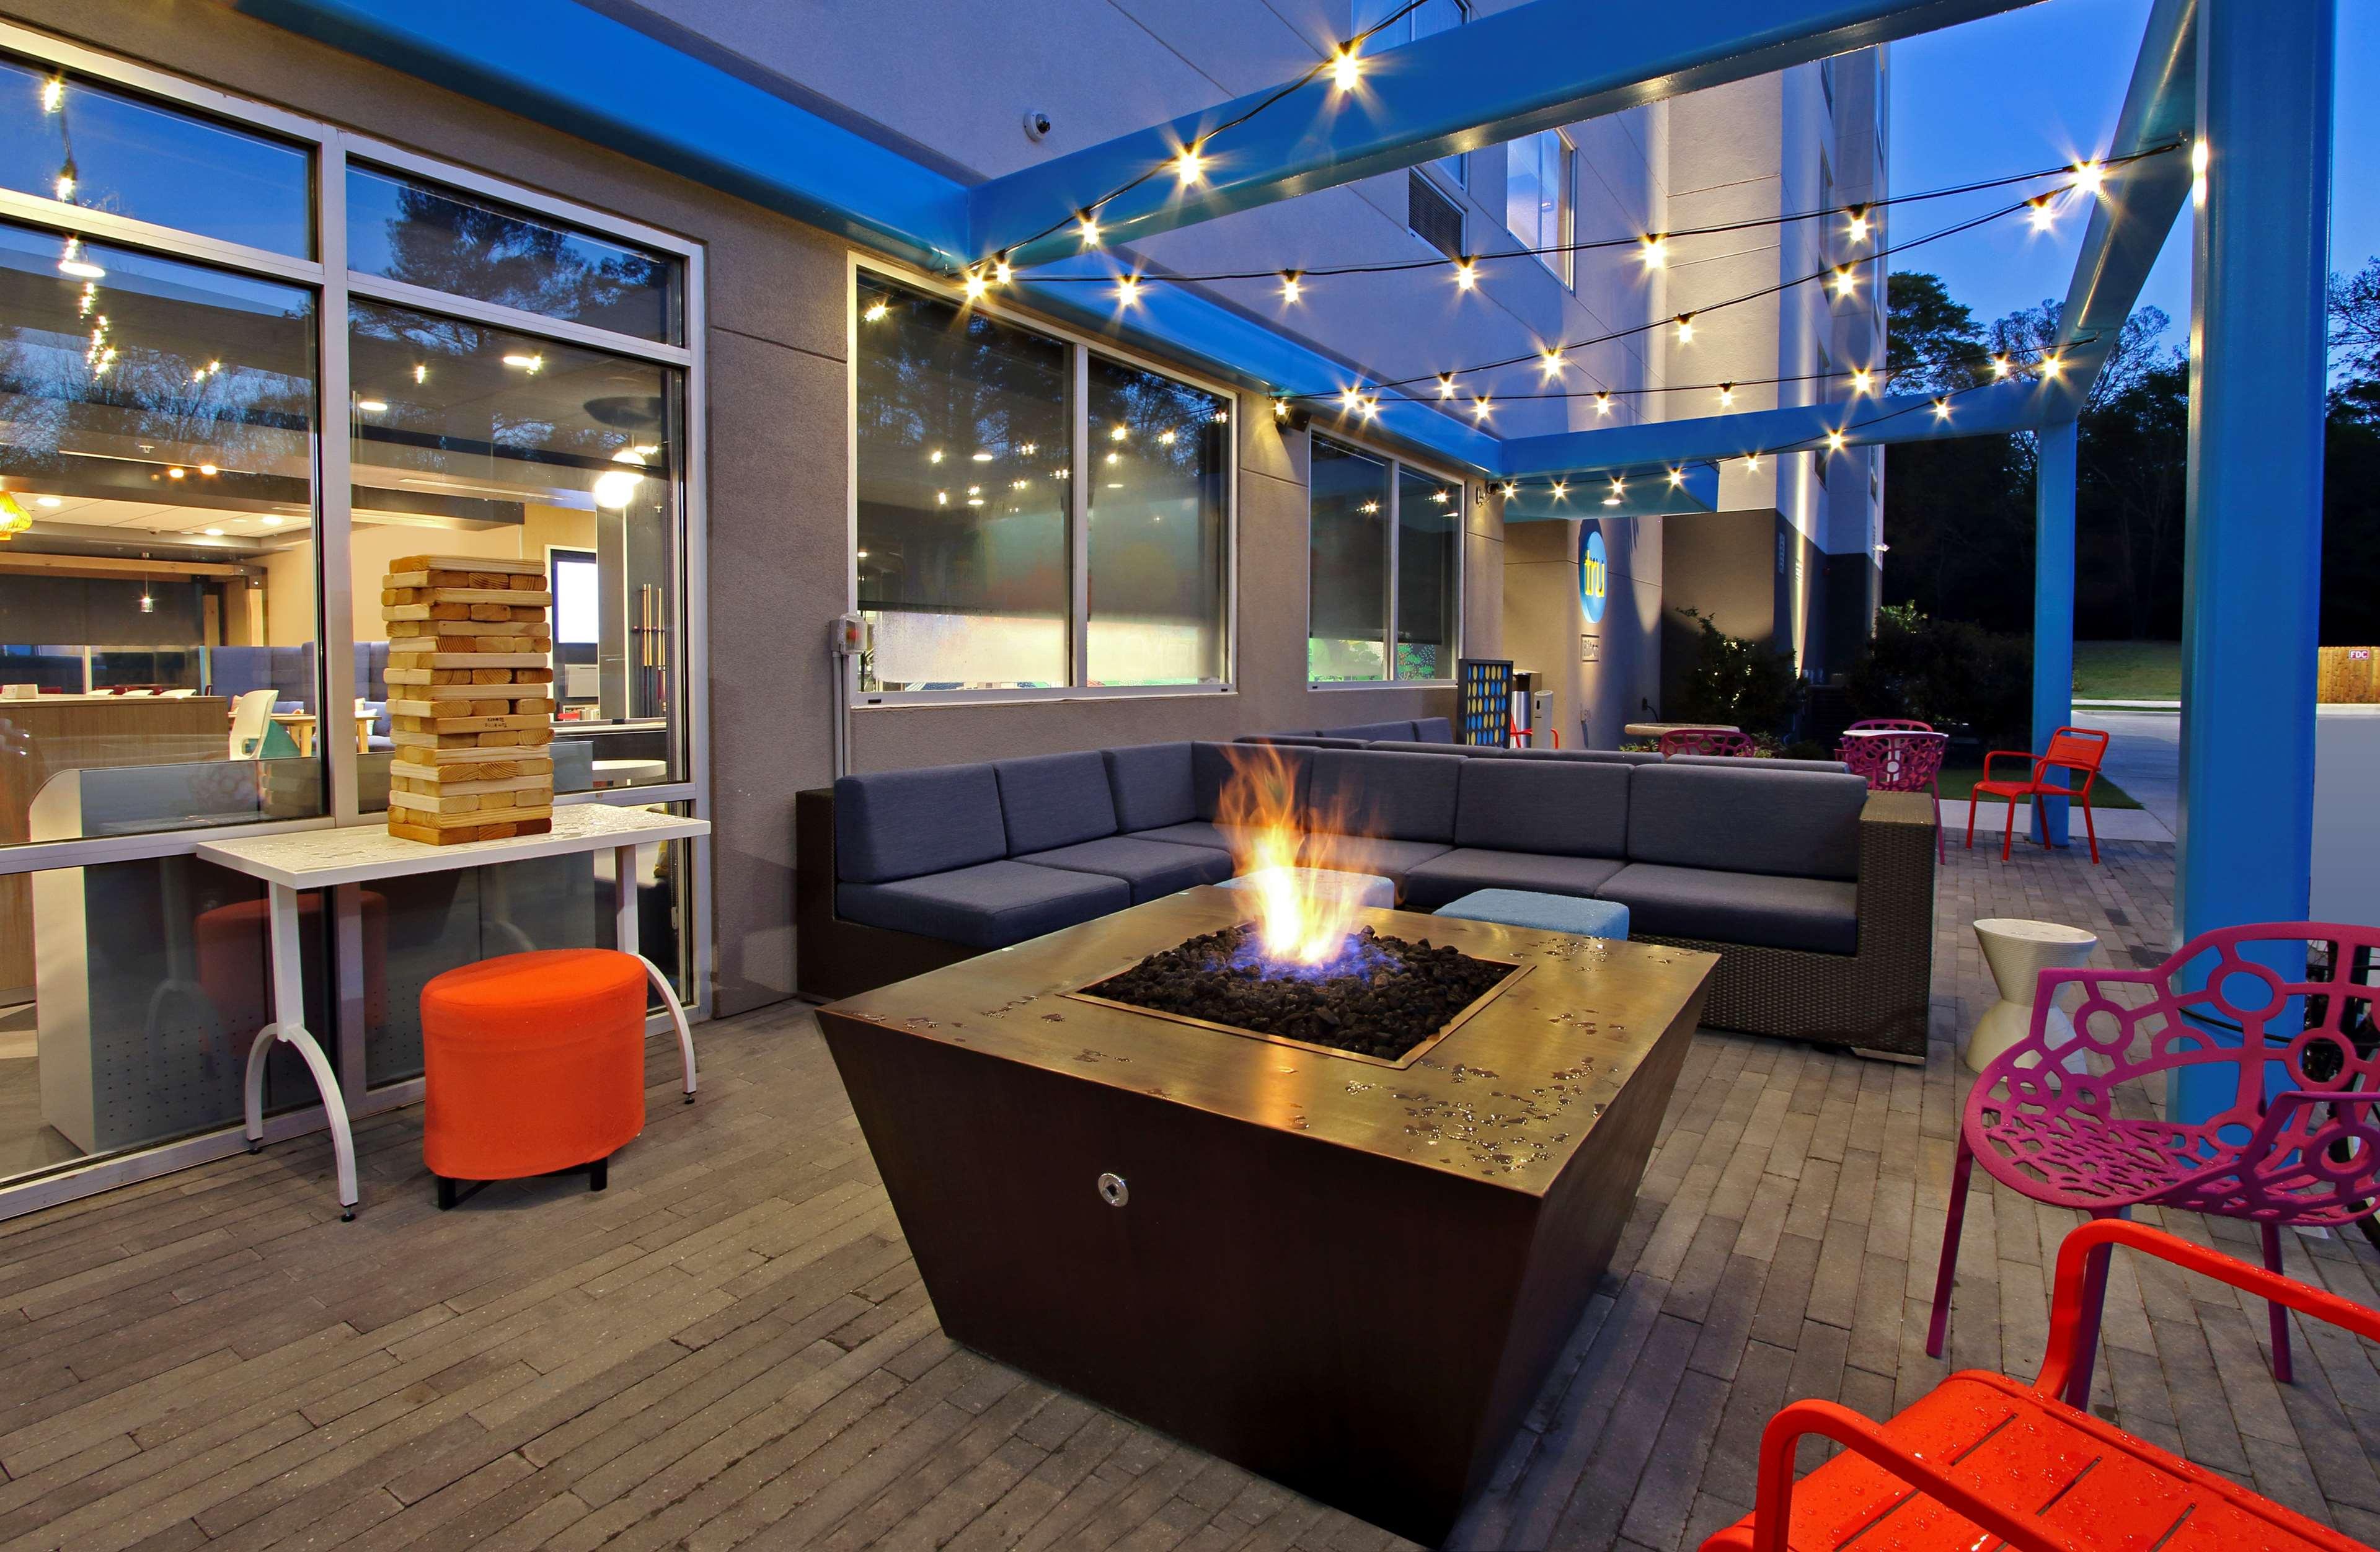 Tru by Hilton Meridian image 1